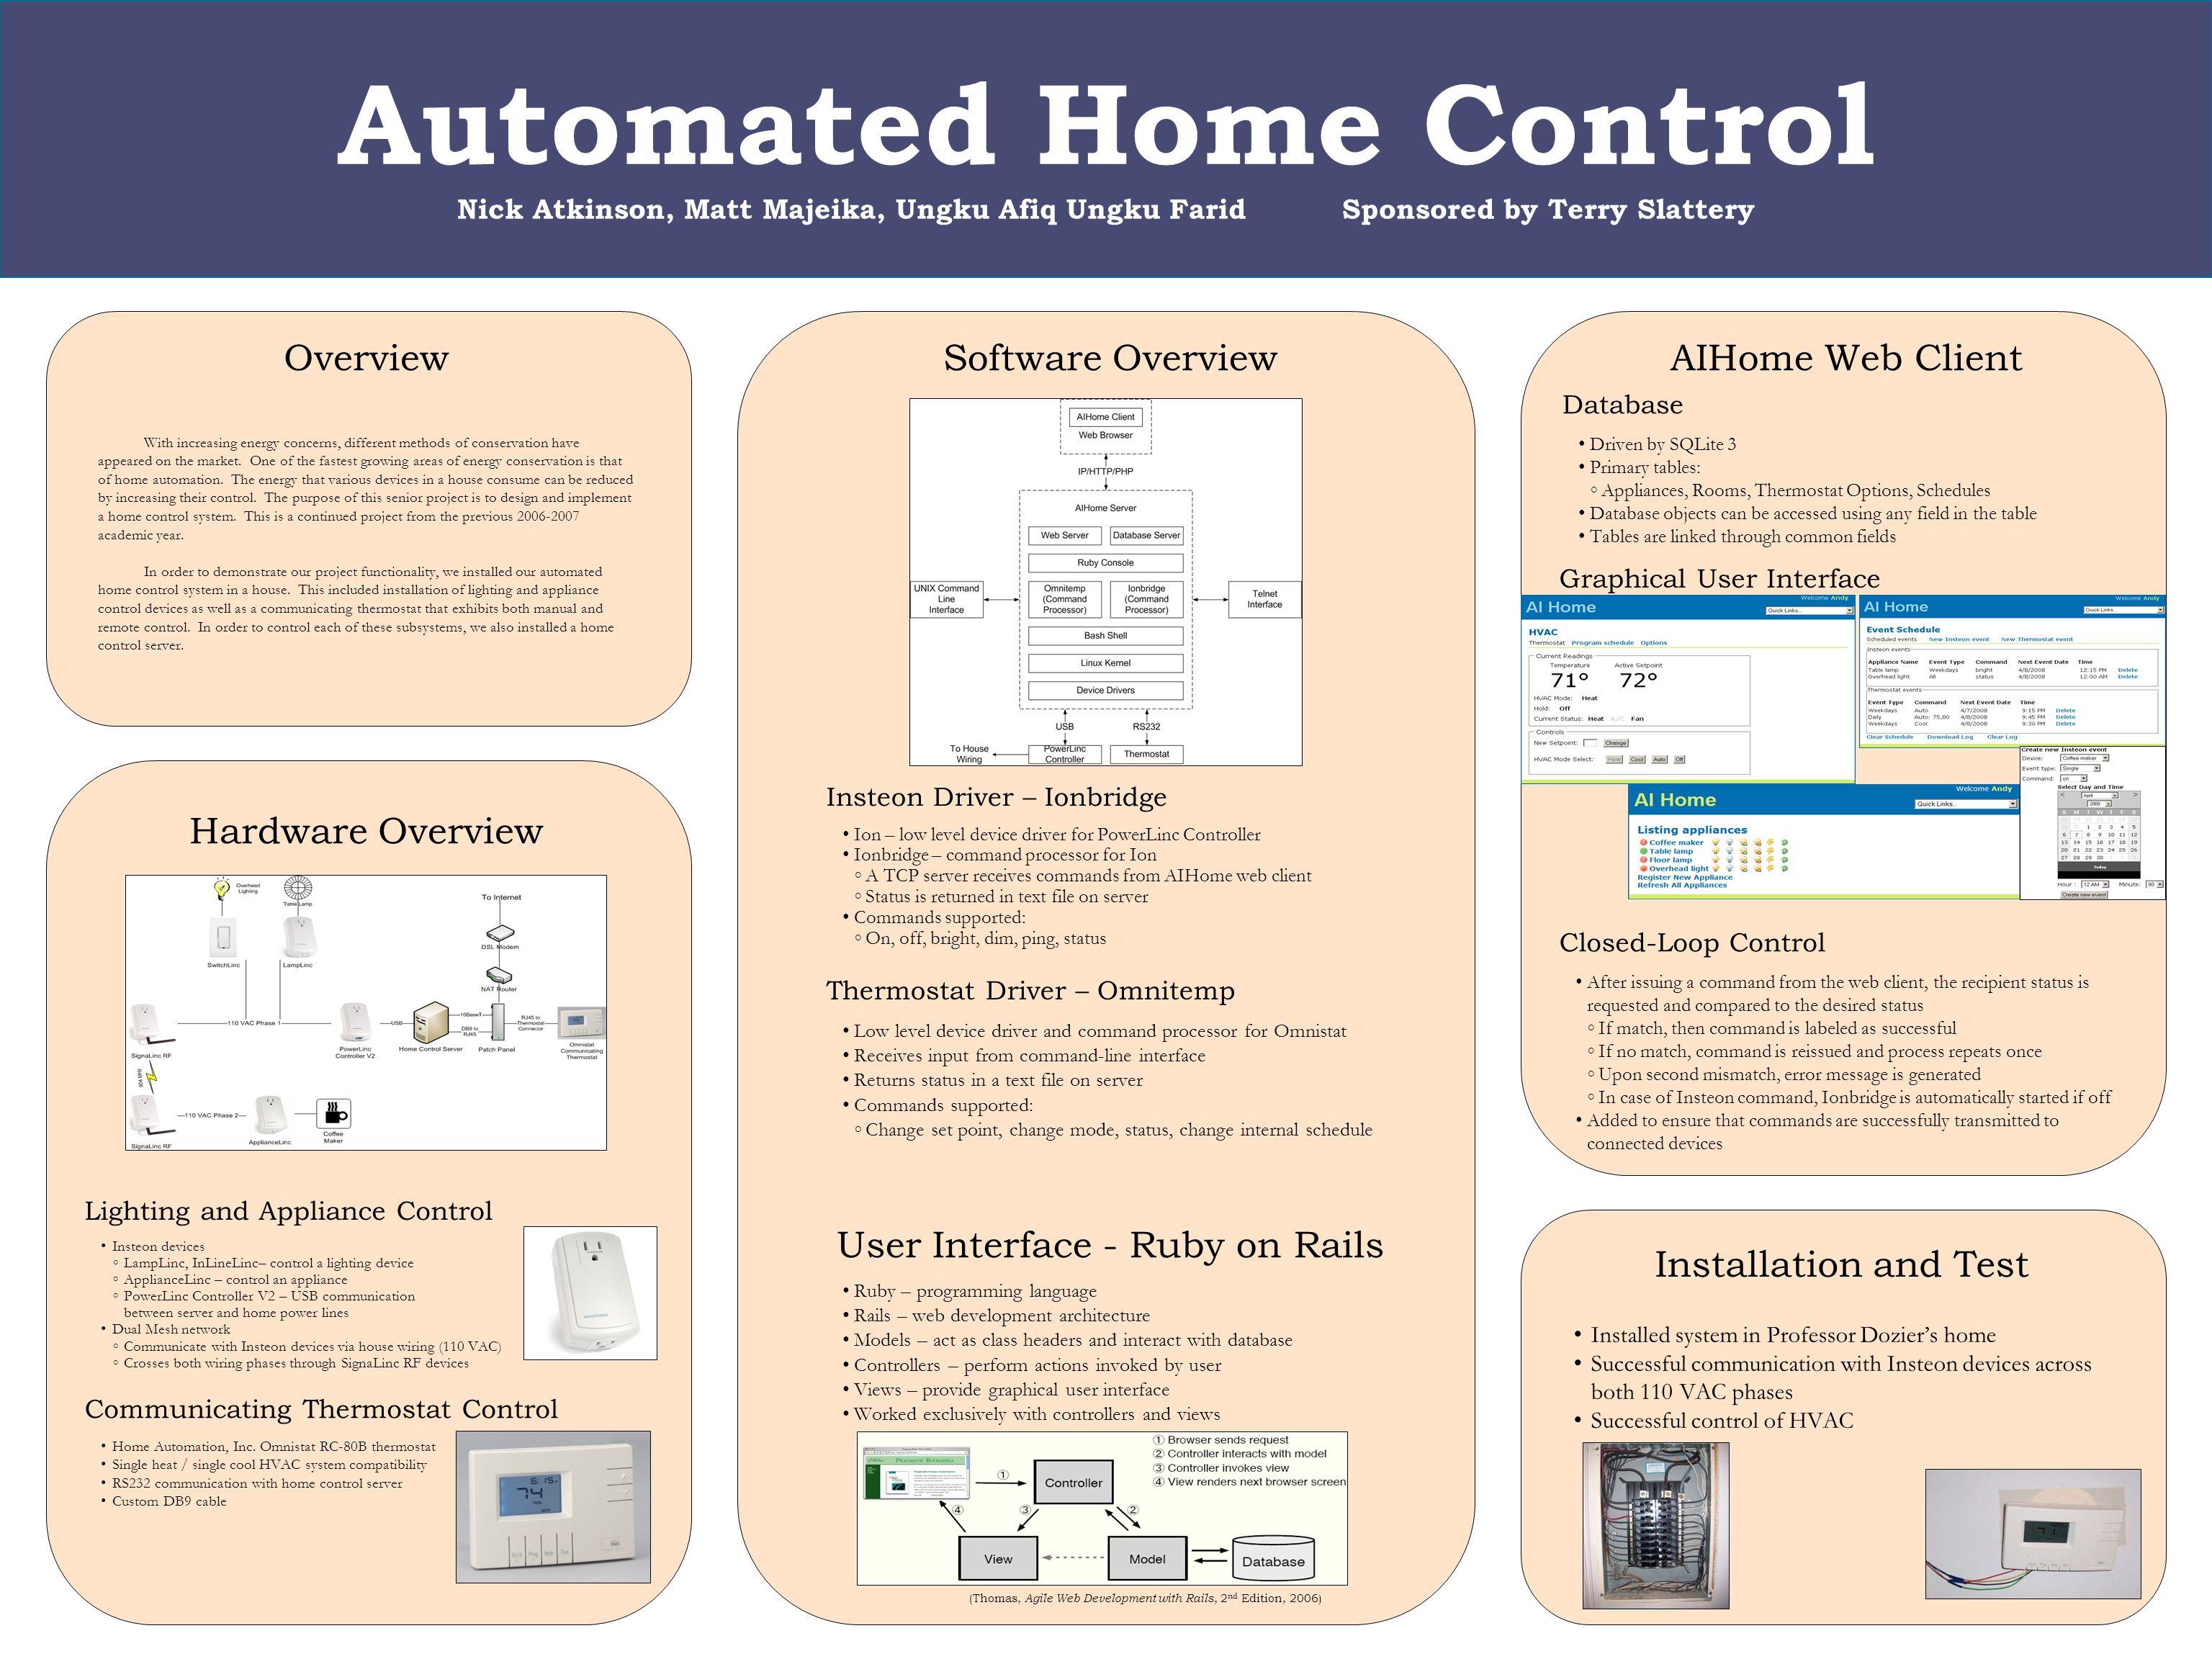 Automated Home Control Nick Atkinson Matt Majeika Ungku Afiq Design And Development Of An System Using 1